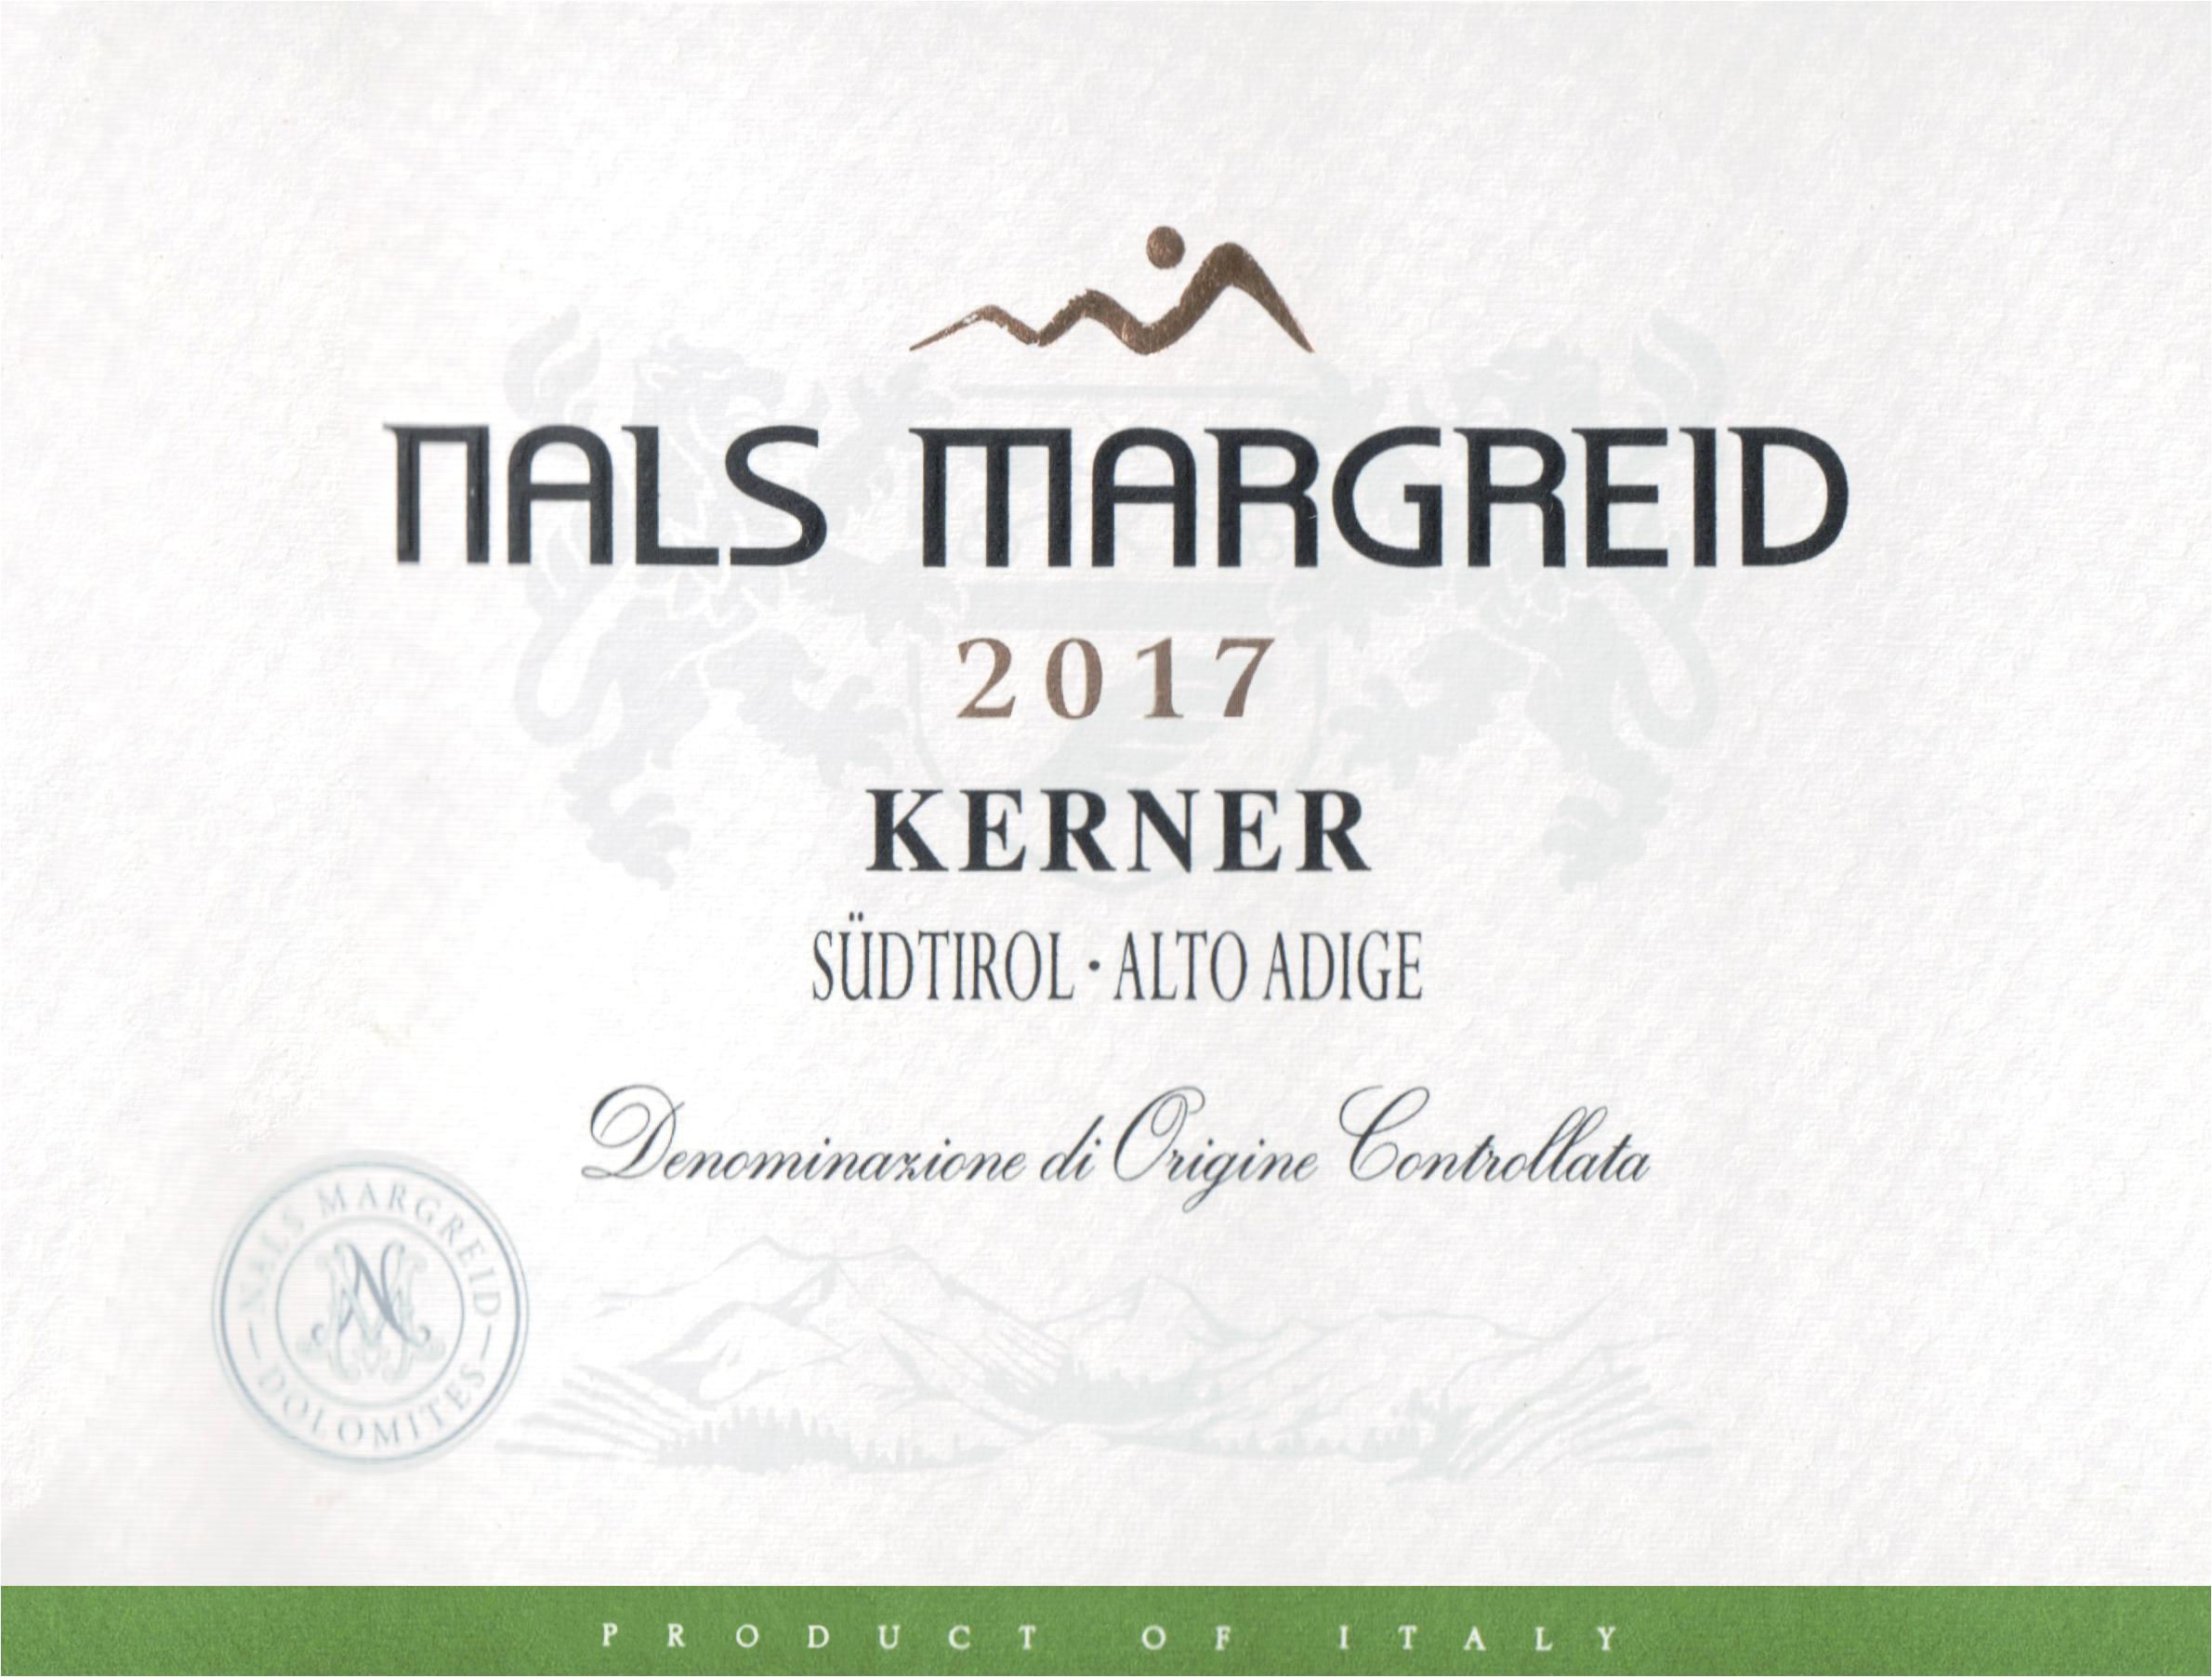 Nals Margreid Kerner Alto Adige 2017